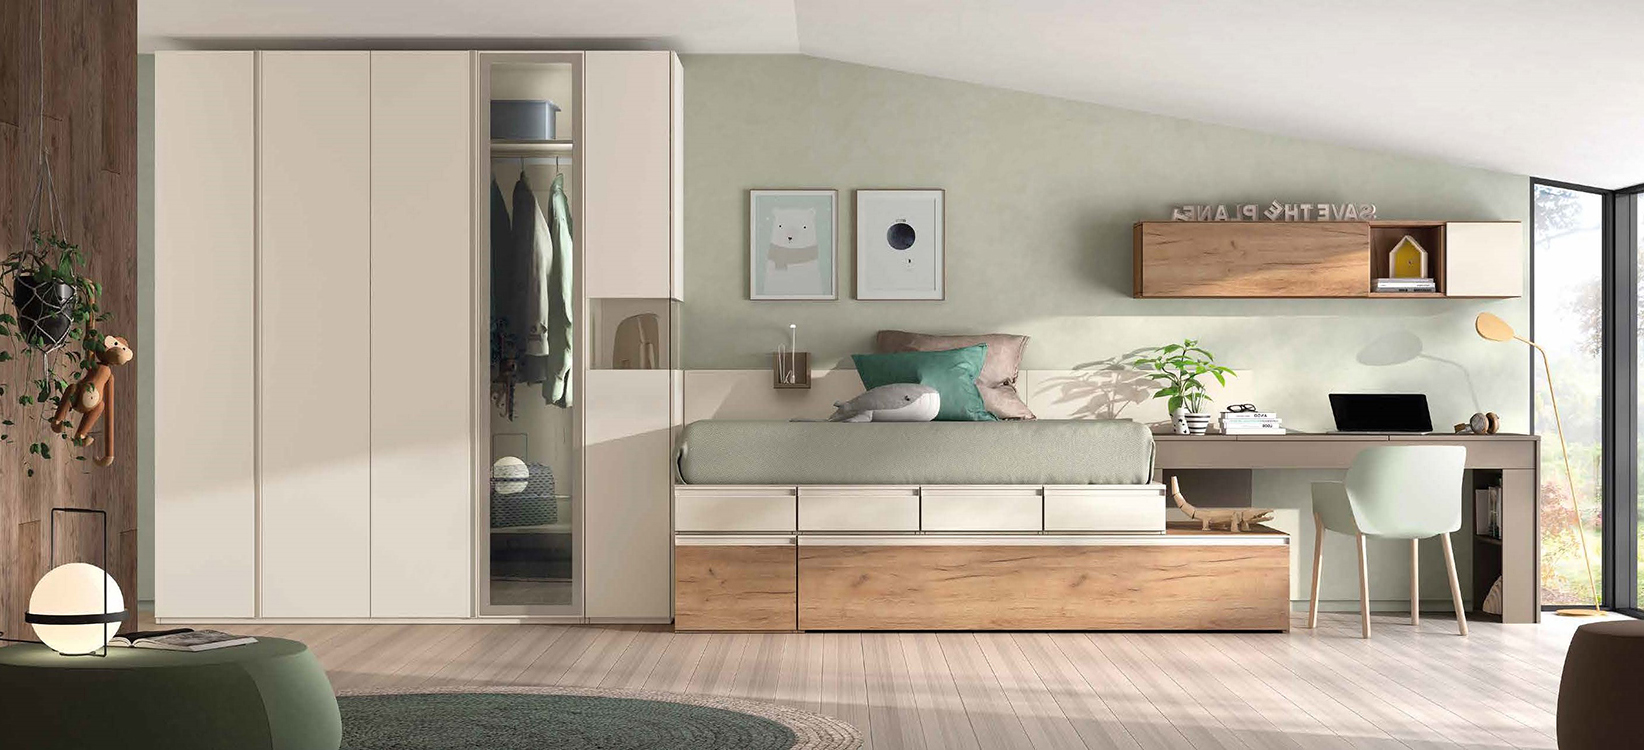 Ofertas en dormitorios juveniles for Ofertas de muebles juveniles